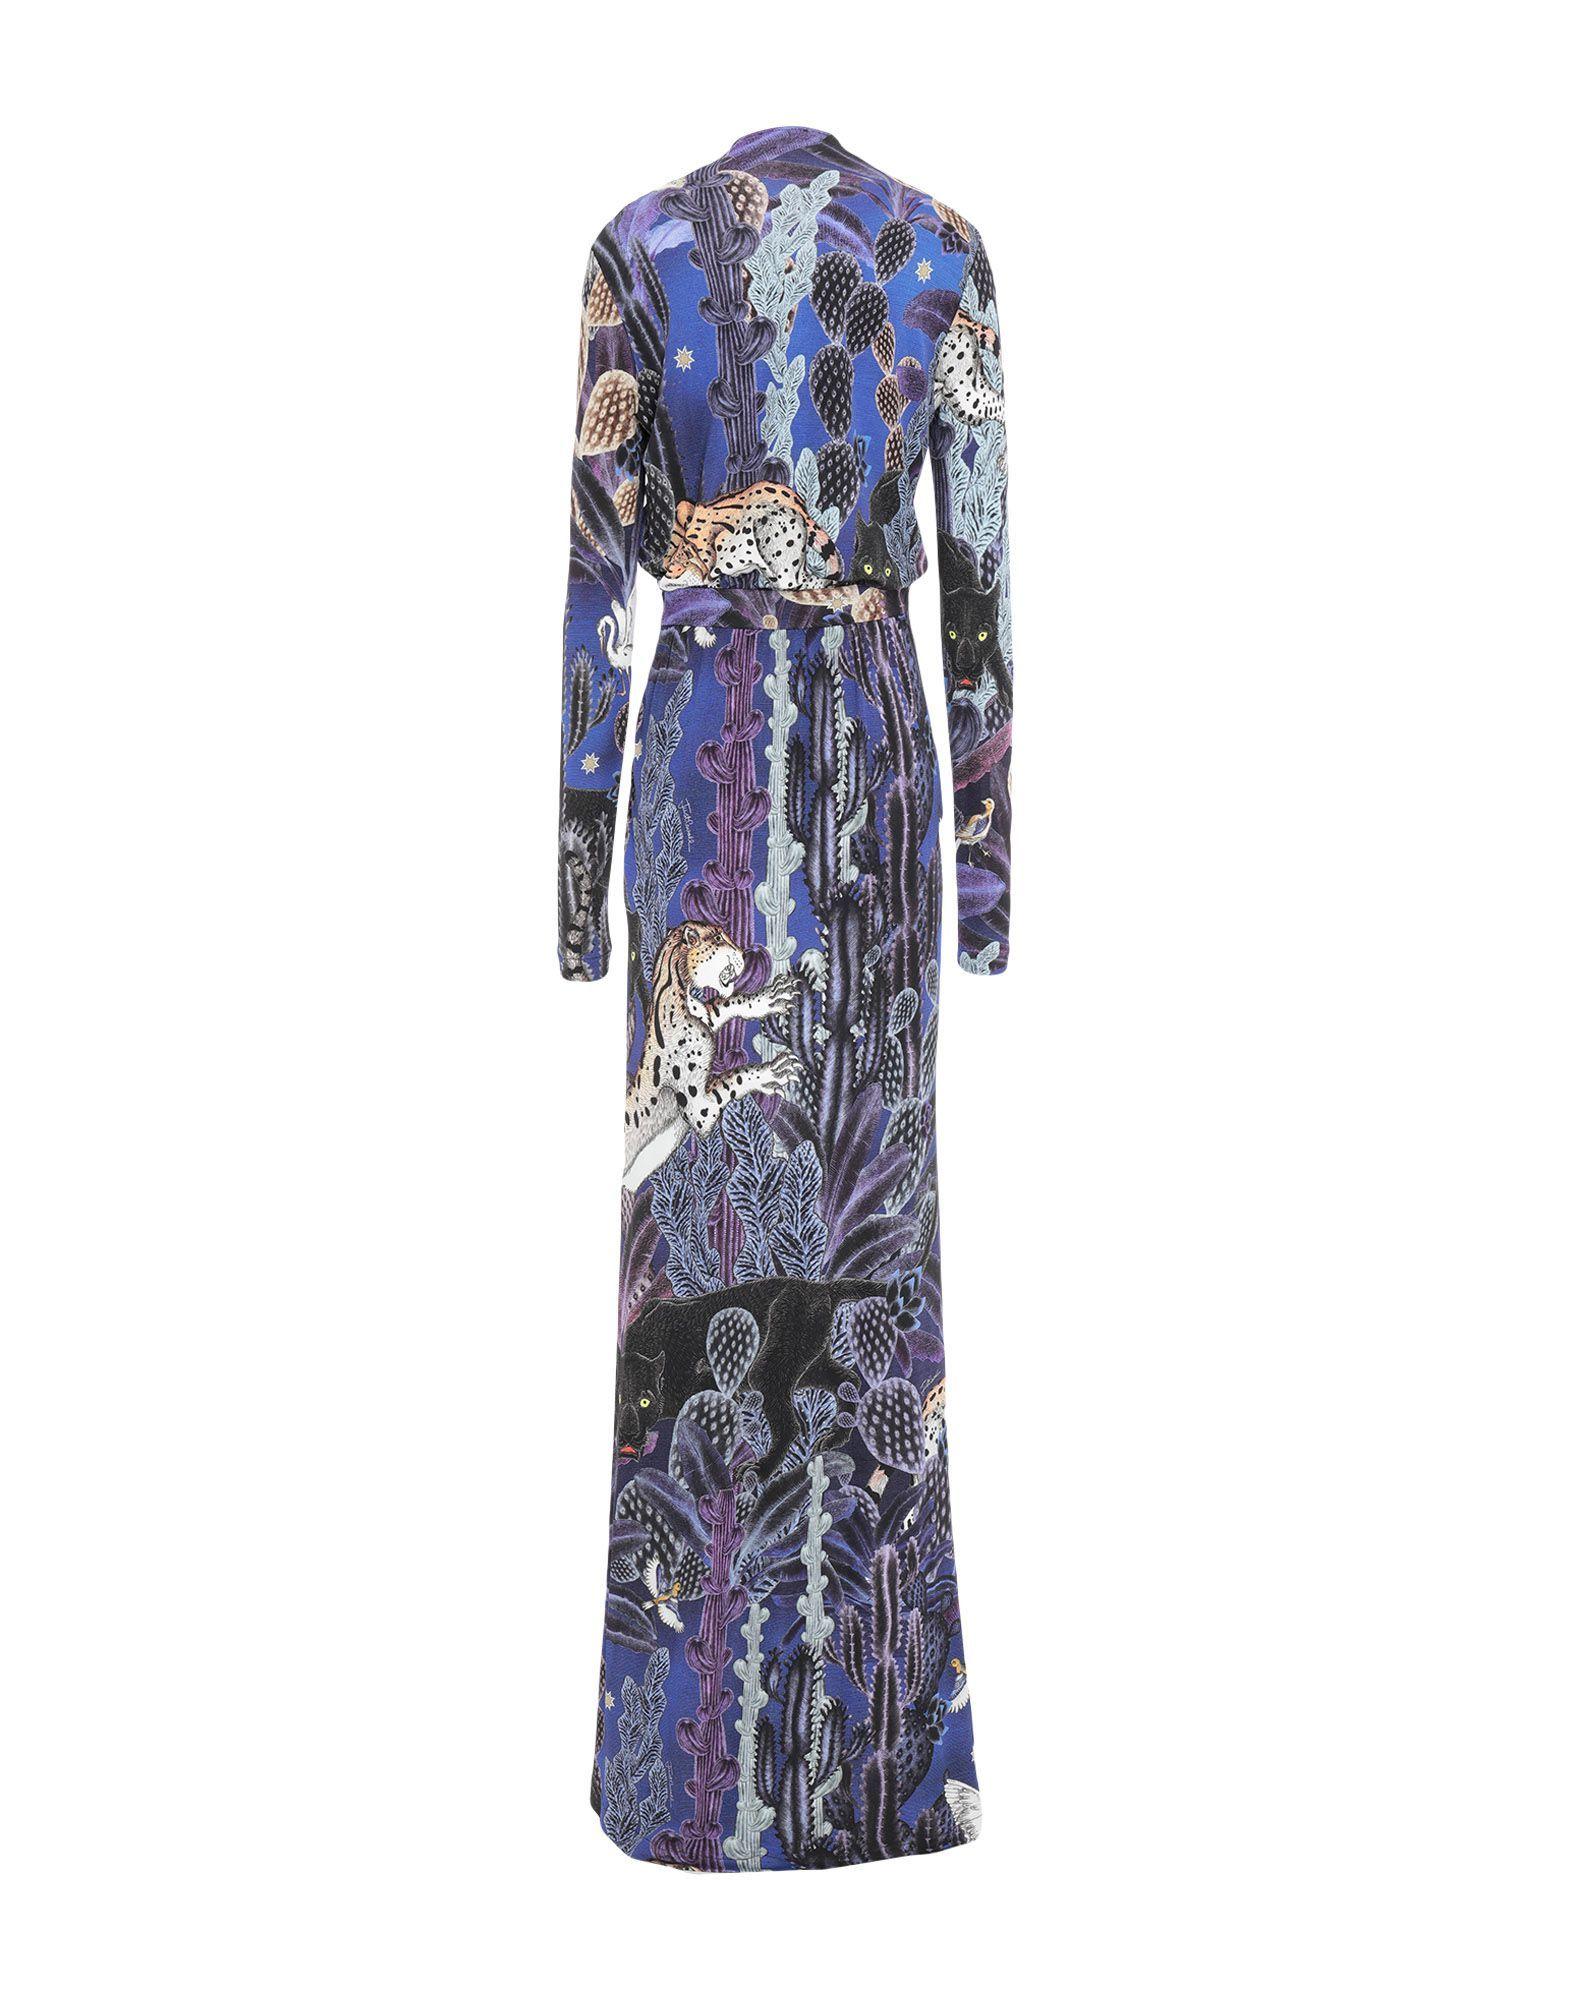 Just Cavalli Purple Print Long Sleeve Full Length Dress